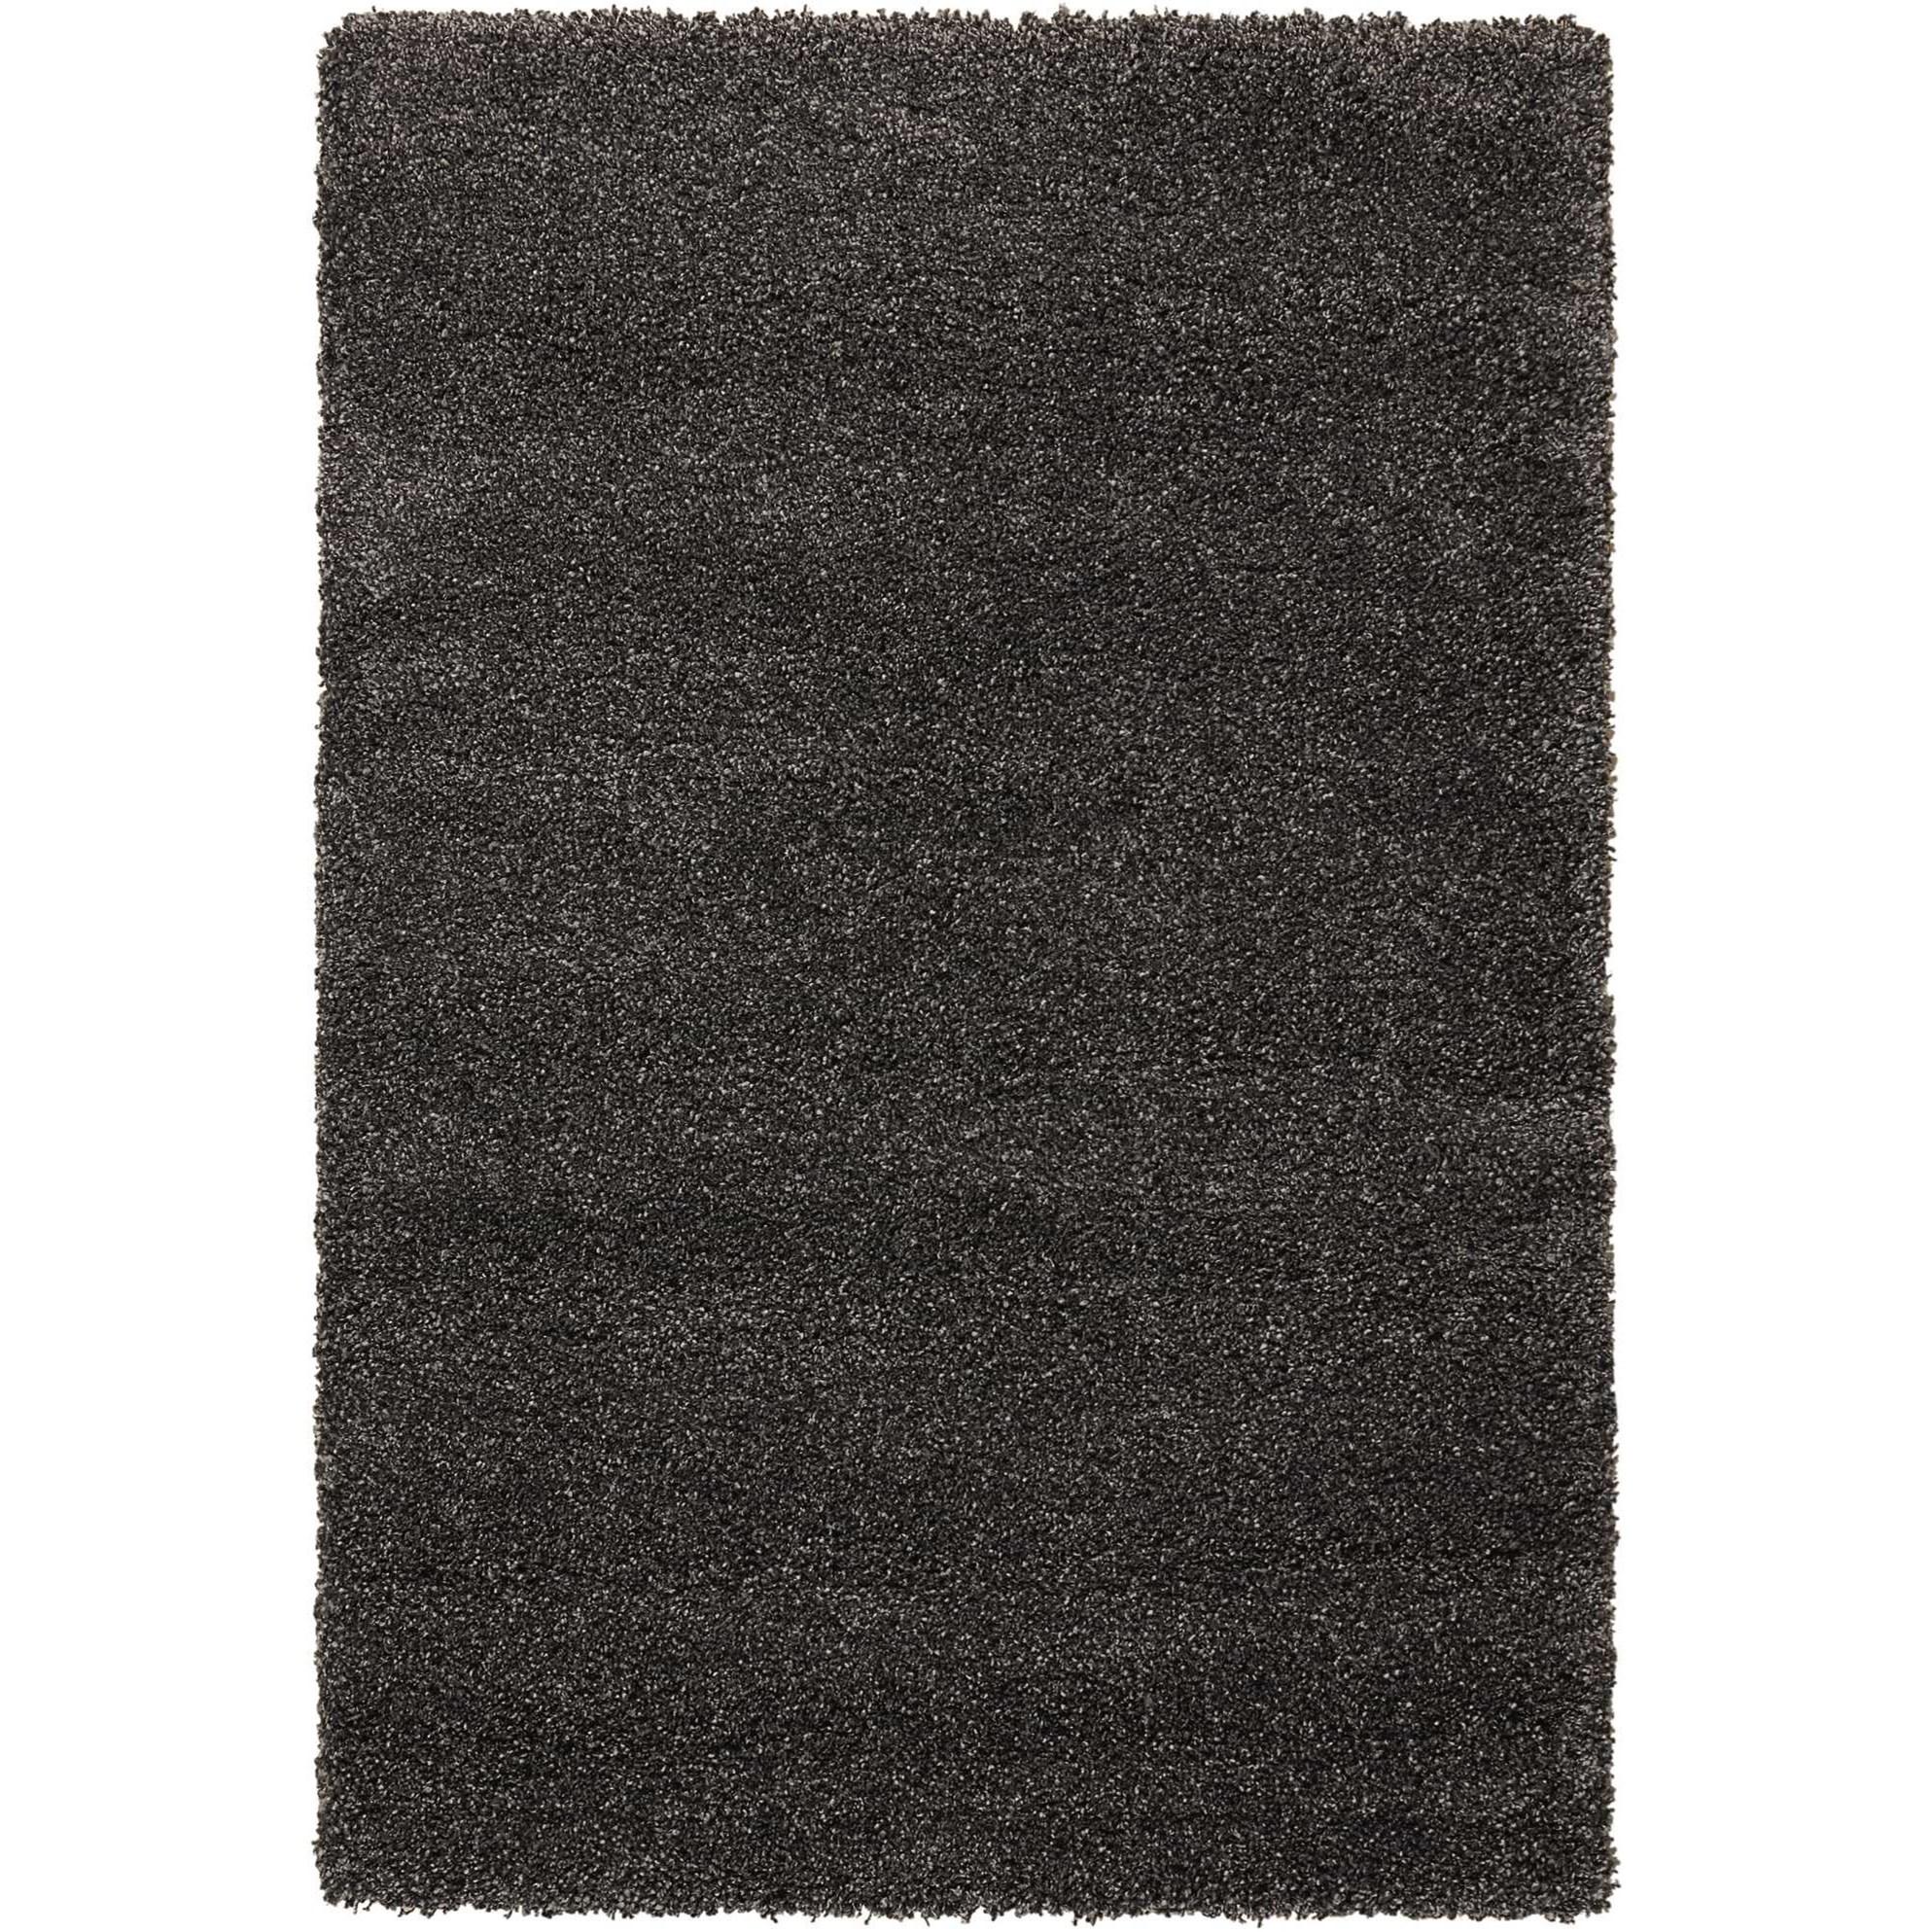 "Amore 7'10"" x 10'10"" Dark Grey Rectangle Rug by Nourison at Sprintz Furniture"